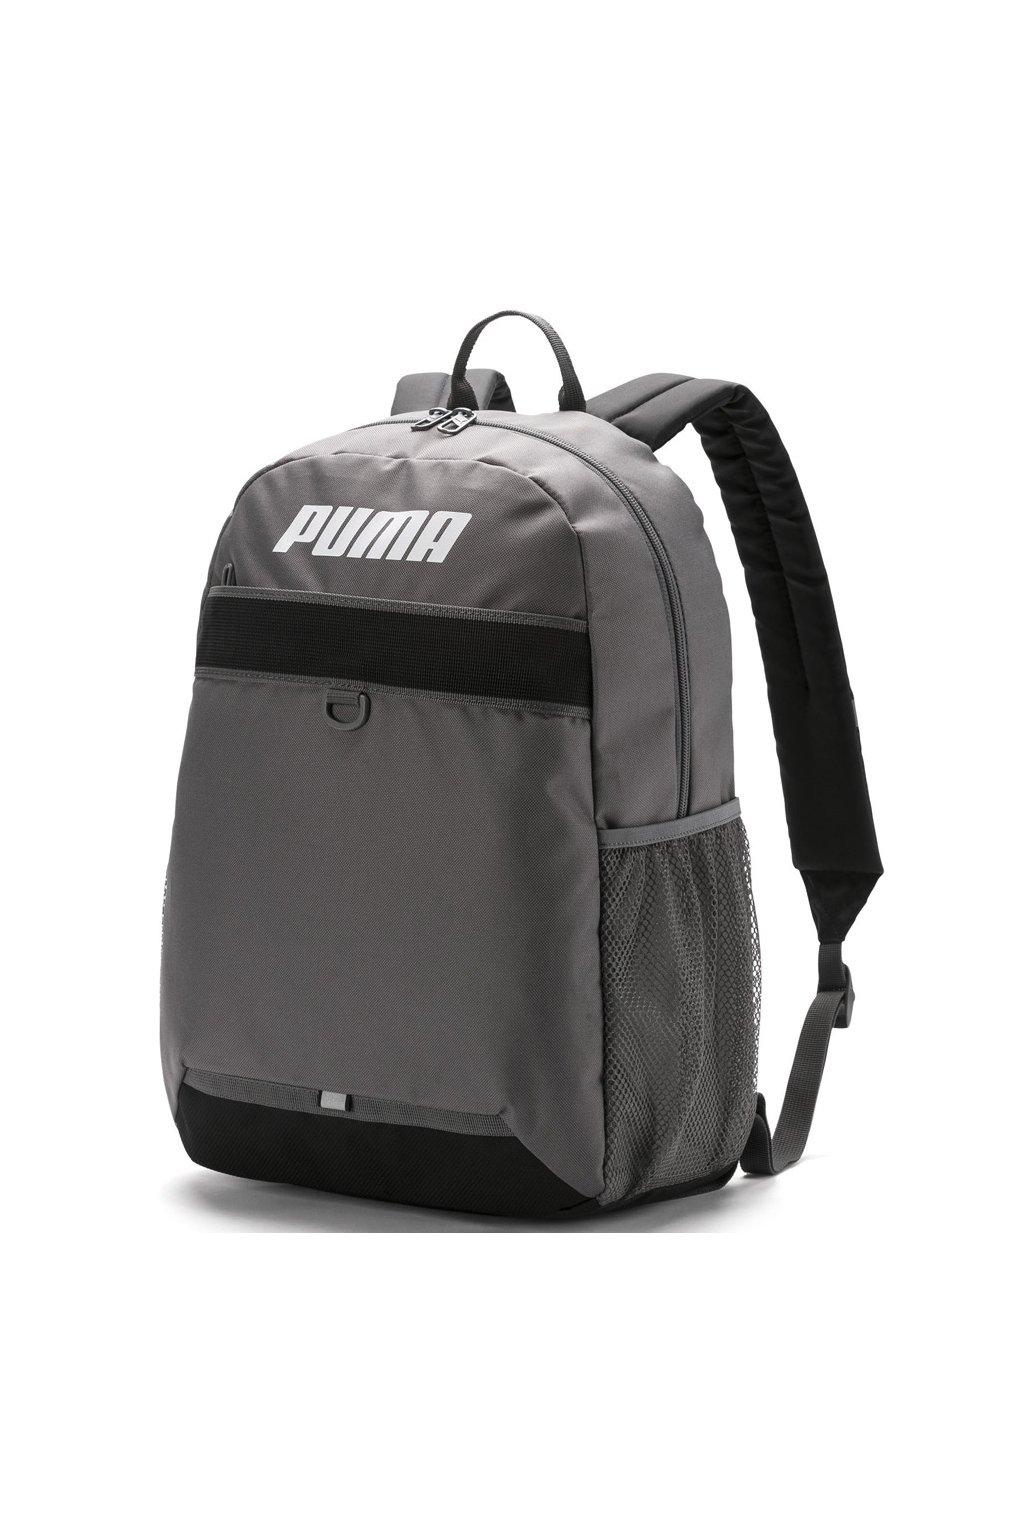 Batoh Puma Plus Backpack 076724 02 šedý 23L